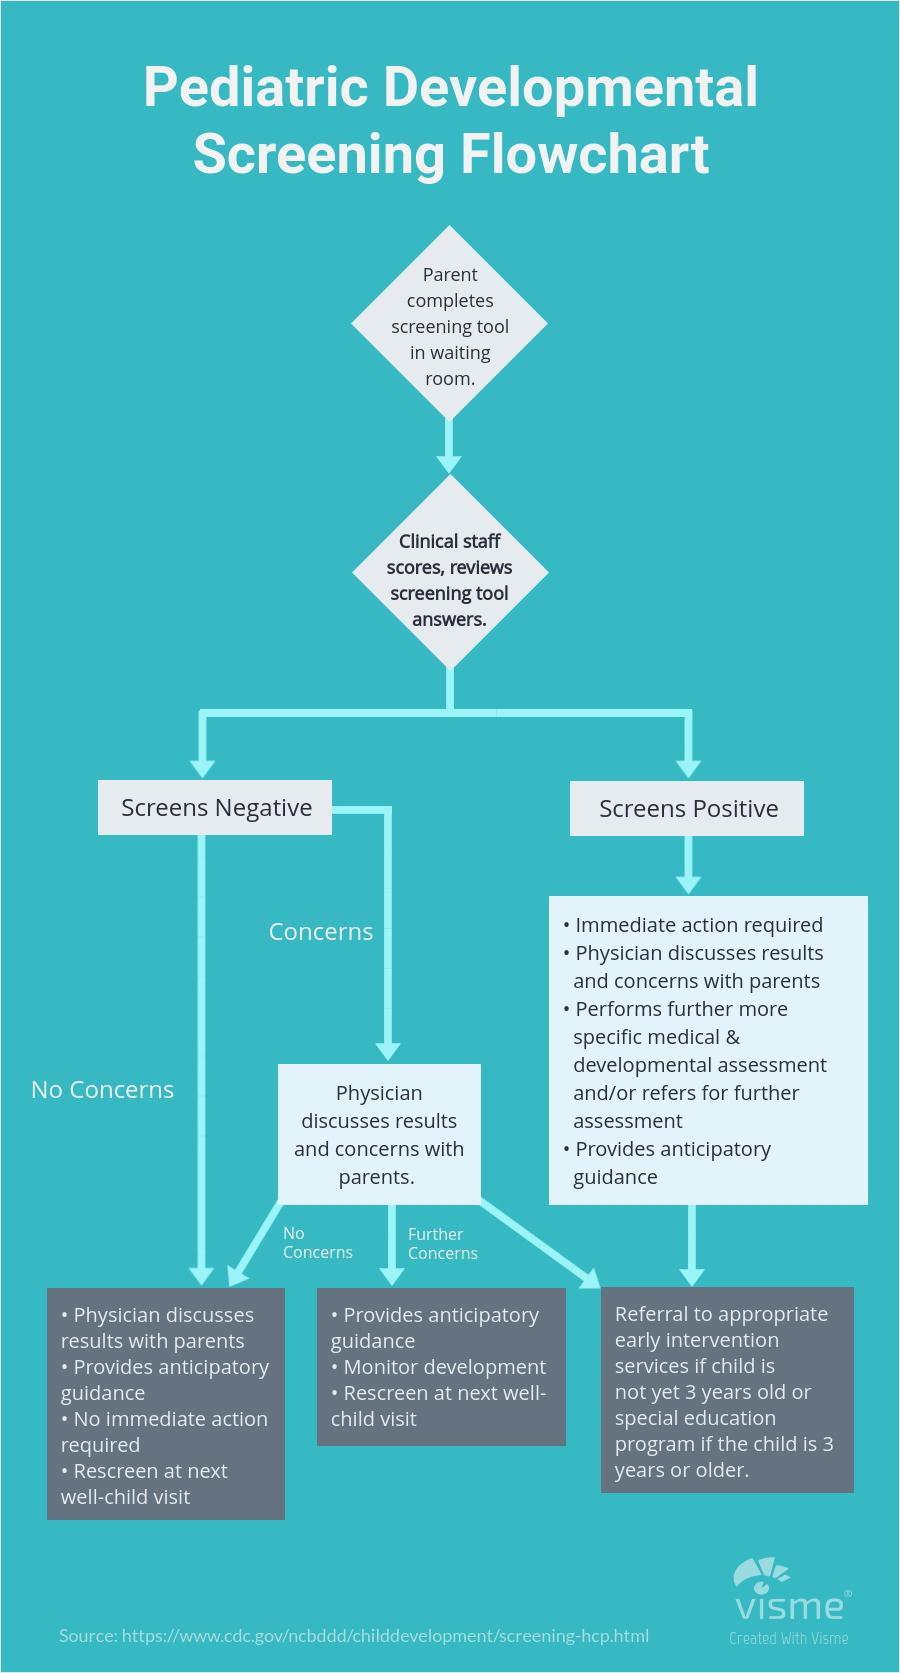 Health and Wellness Flow charts - 44 نوع نمودار برای کاربردهای گوناگون